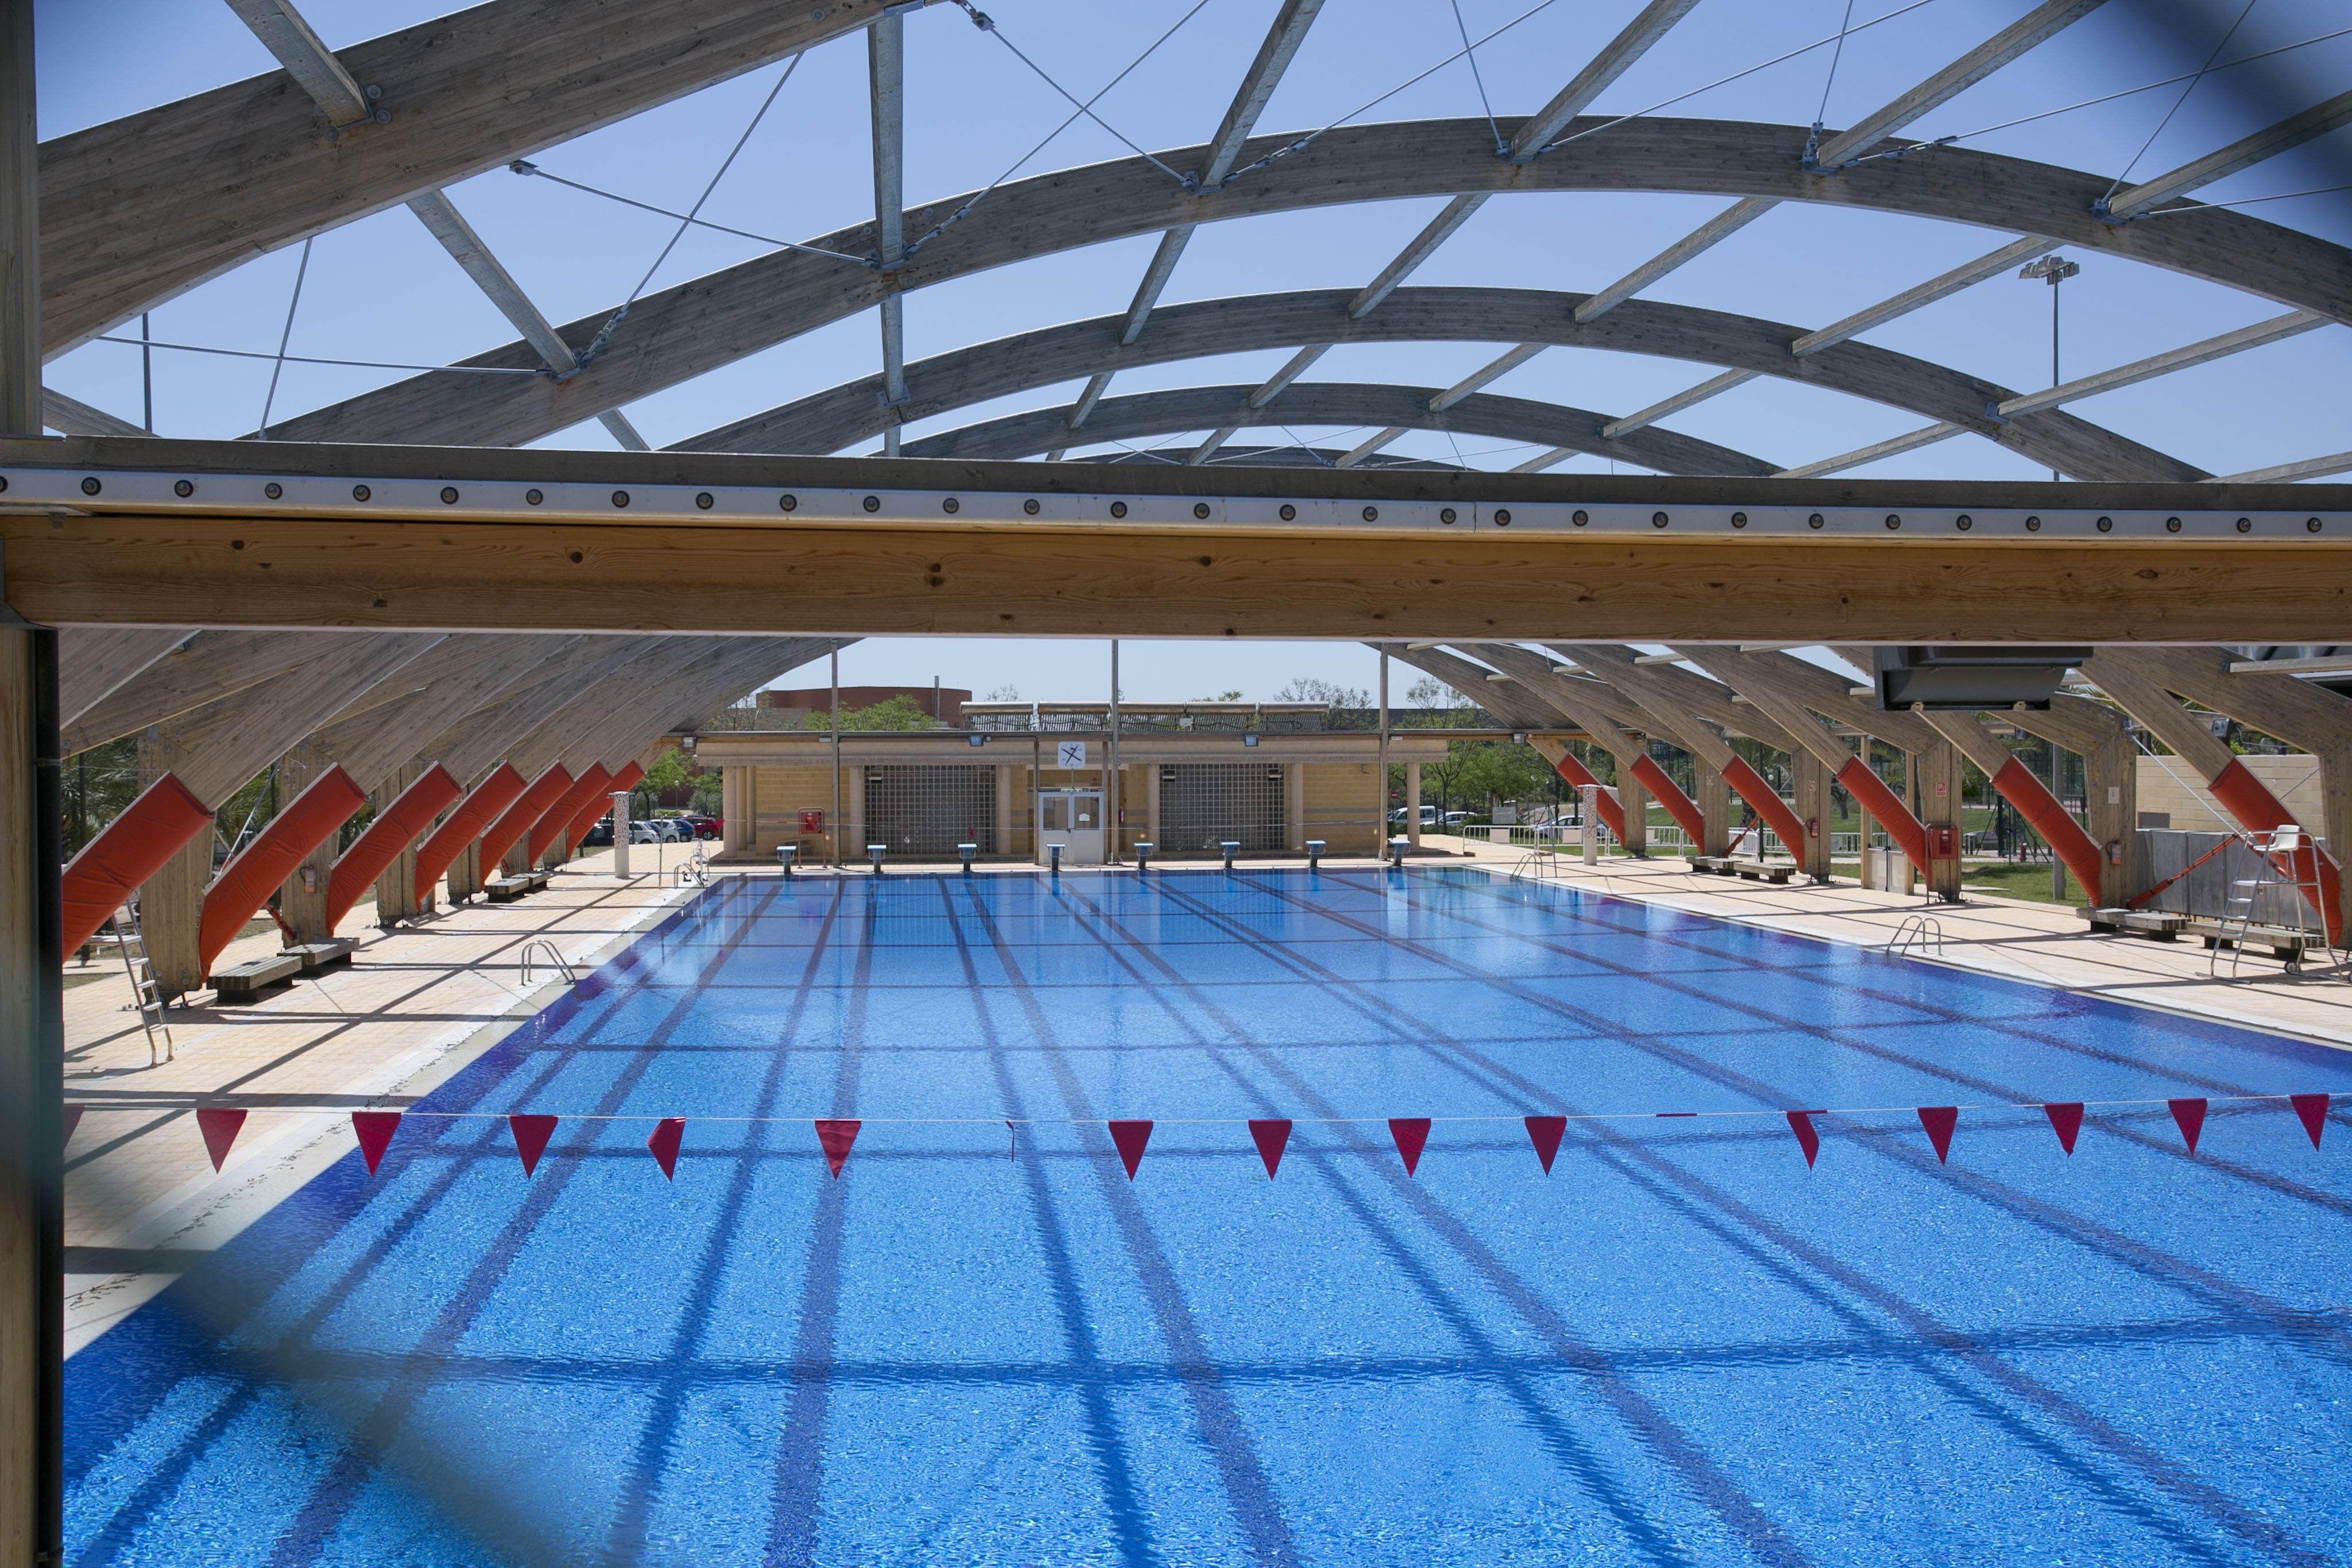 Piscina ol mpica en la umh campus de elche pinterest for Diseno grafico de piscina olimpica